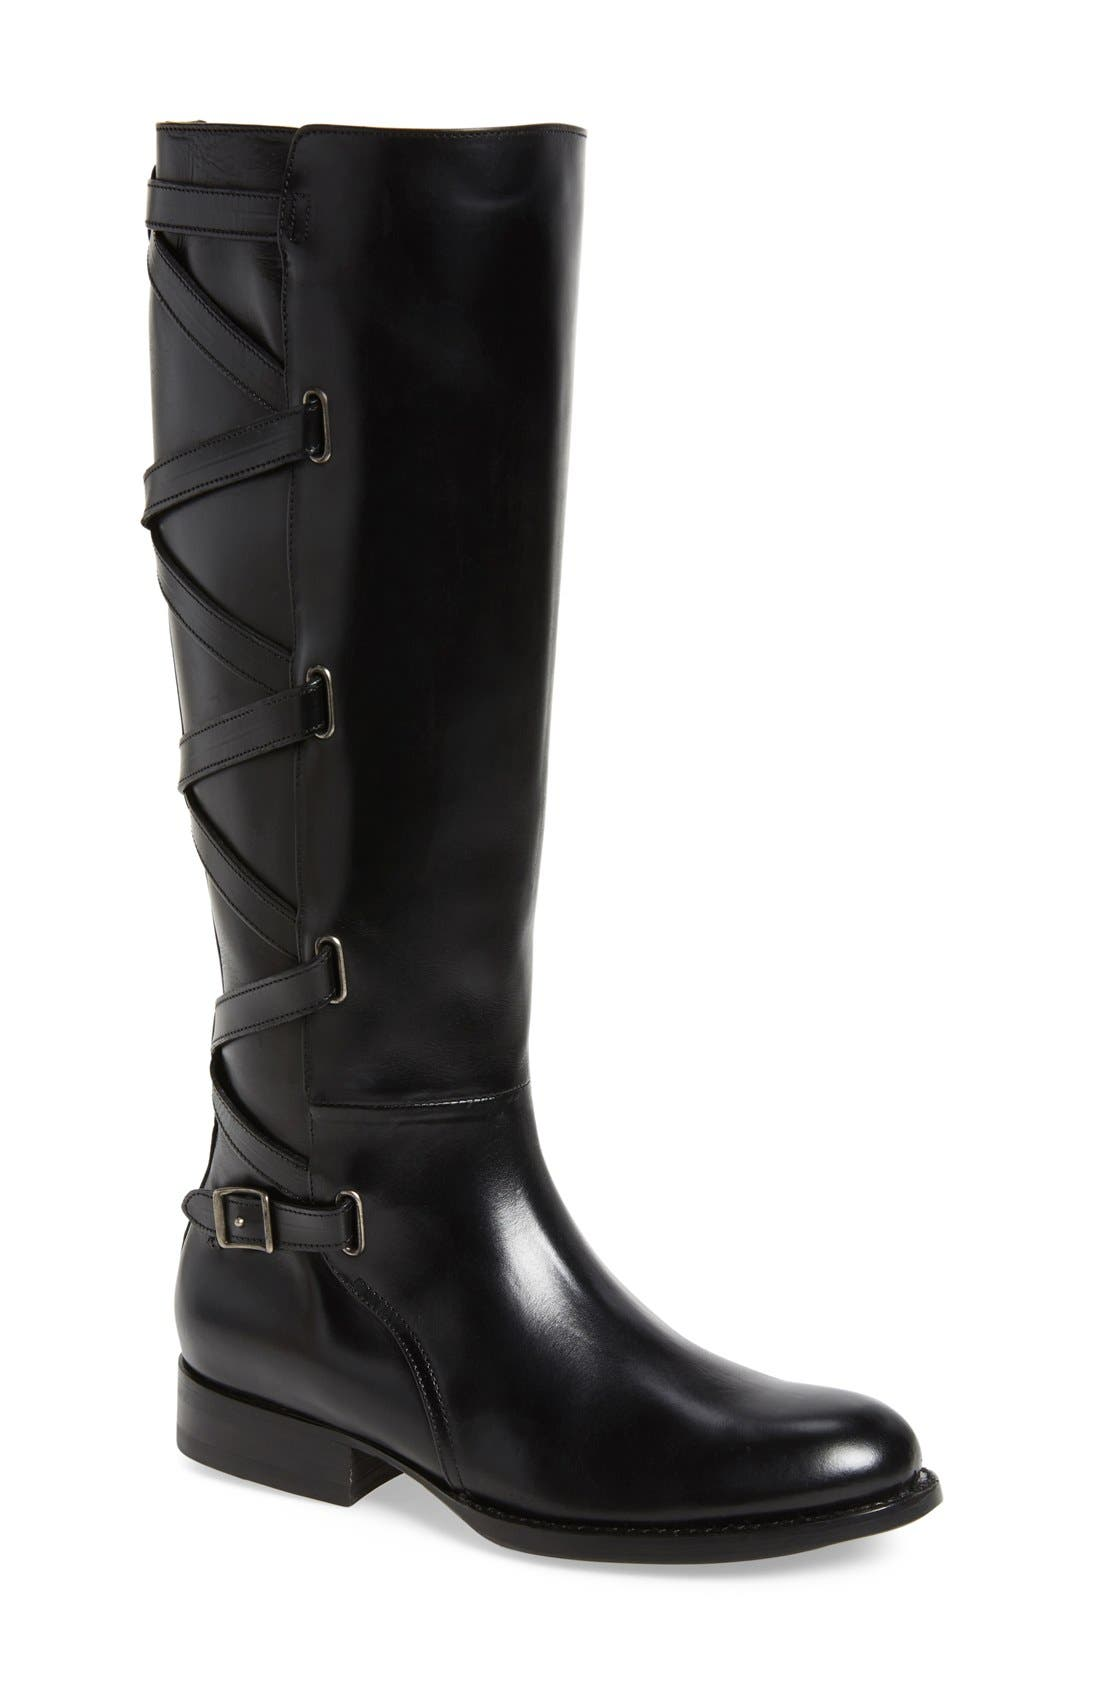 Main Image - Frye Jordan Strappy Knee High Boot (Women)